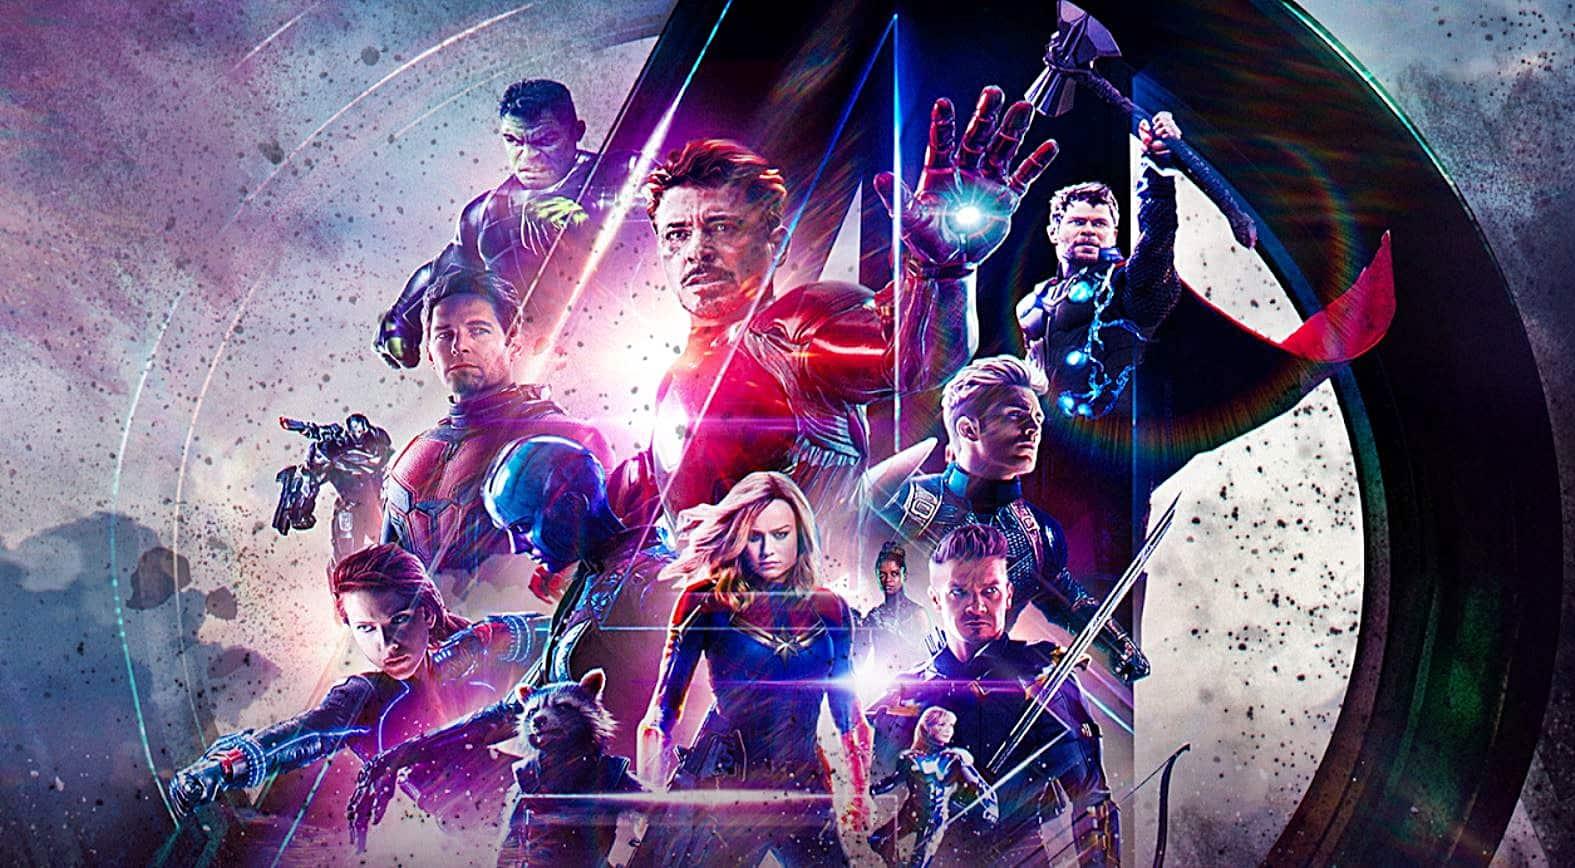 ¿Podría ser este el mega villano de Avengers: Endgame?